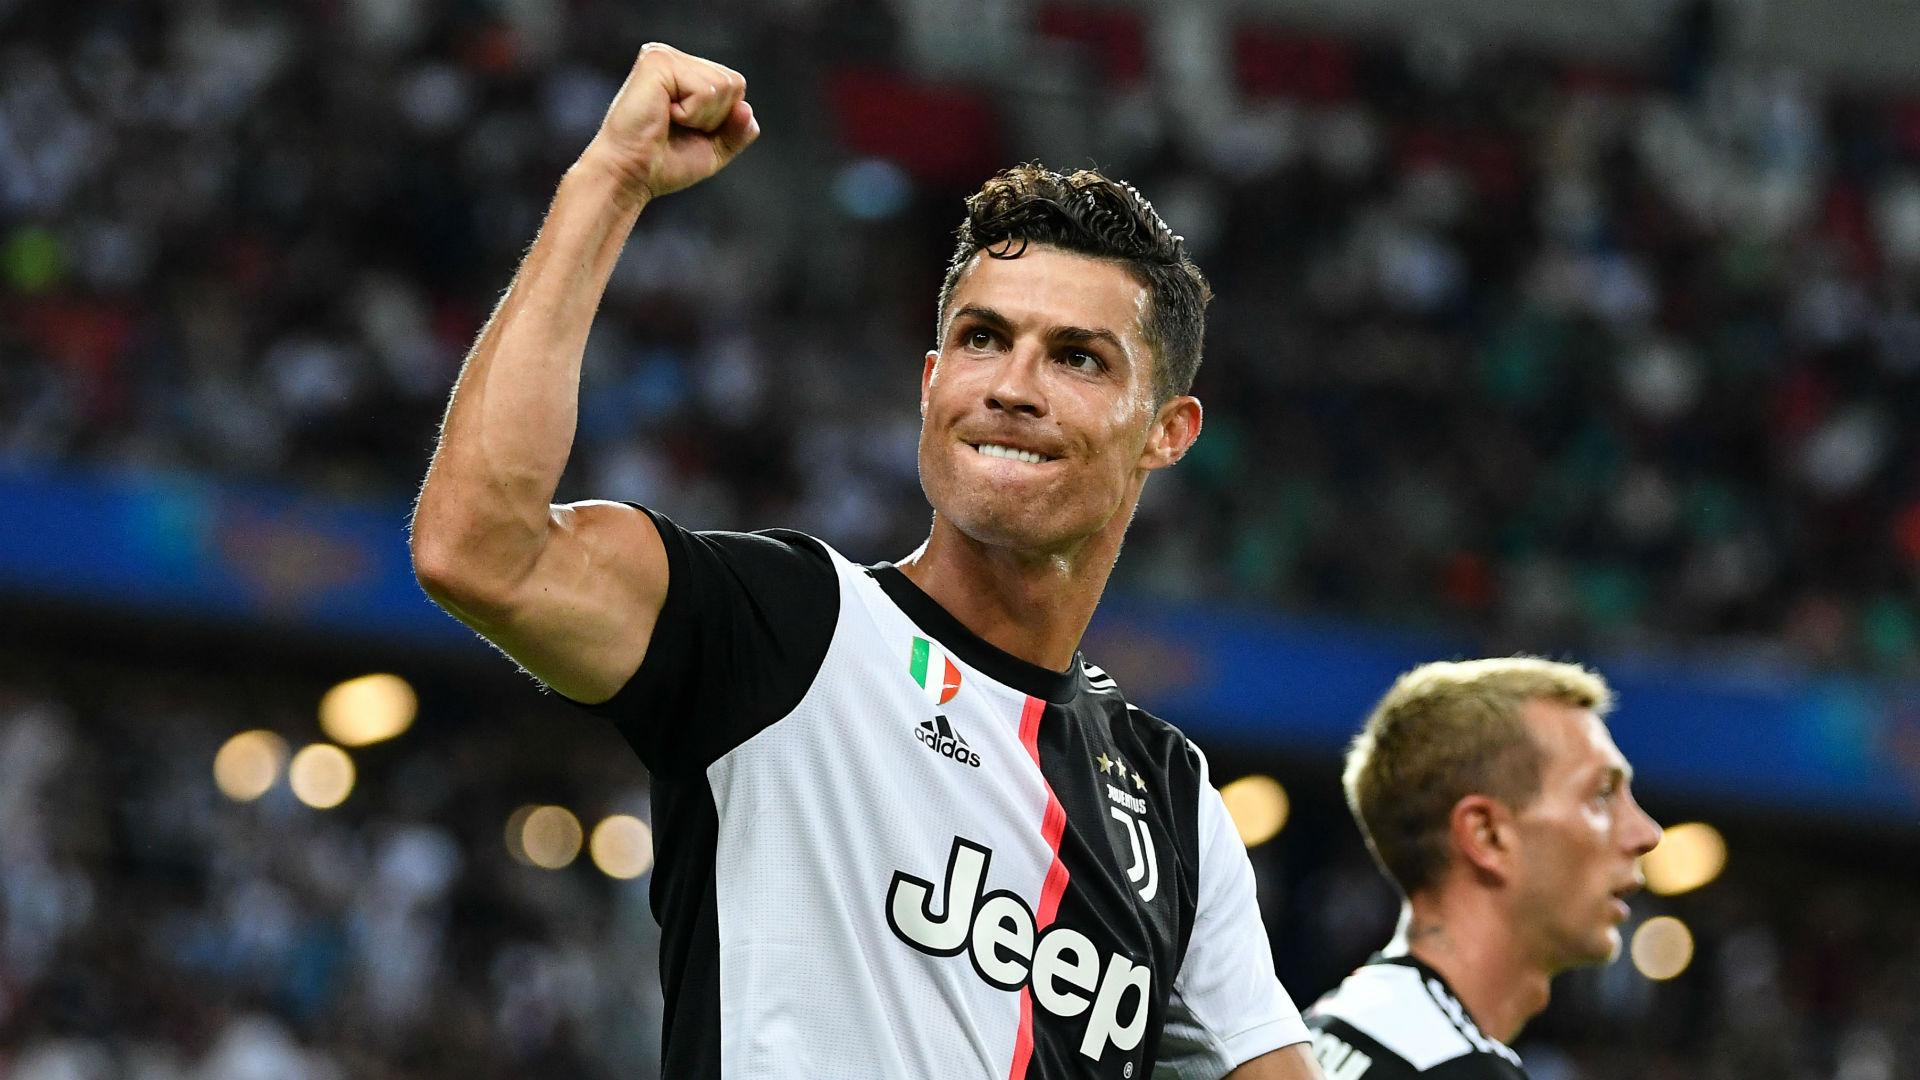 Ronaldo 700: The milestones of a goalscoring great